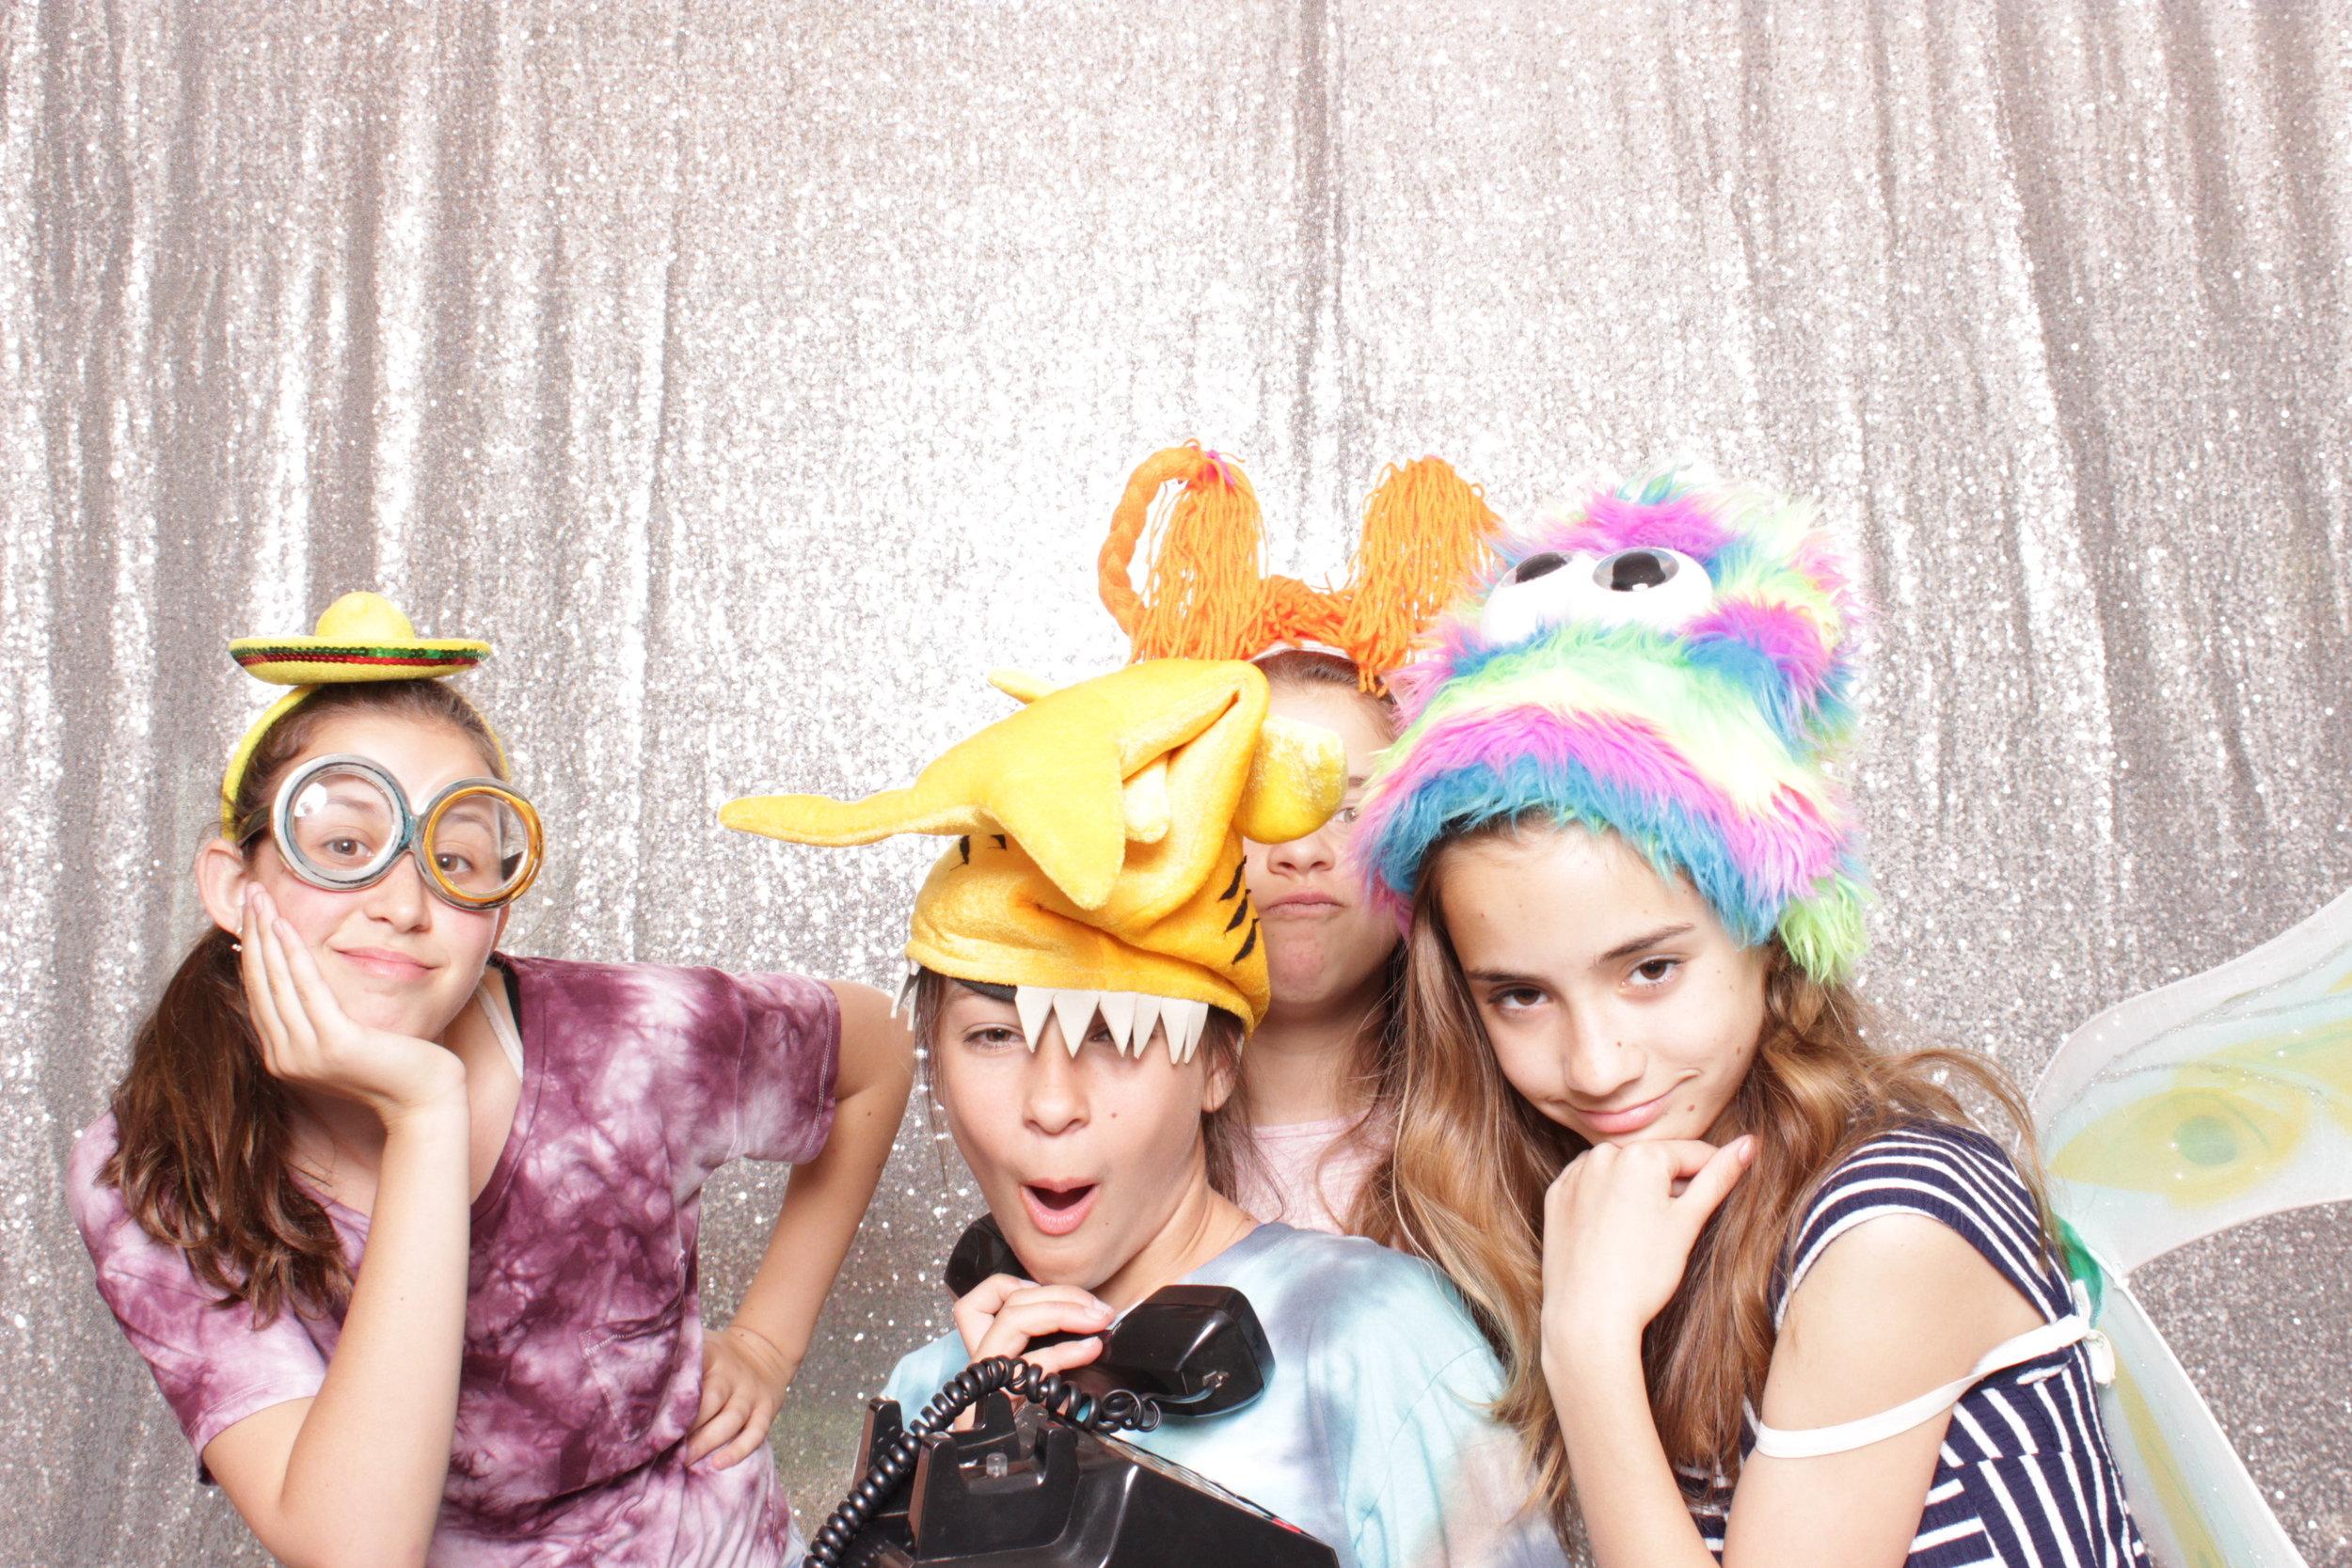 chico-photo-booth-rental-birthday-fun.jpg